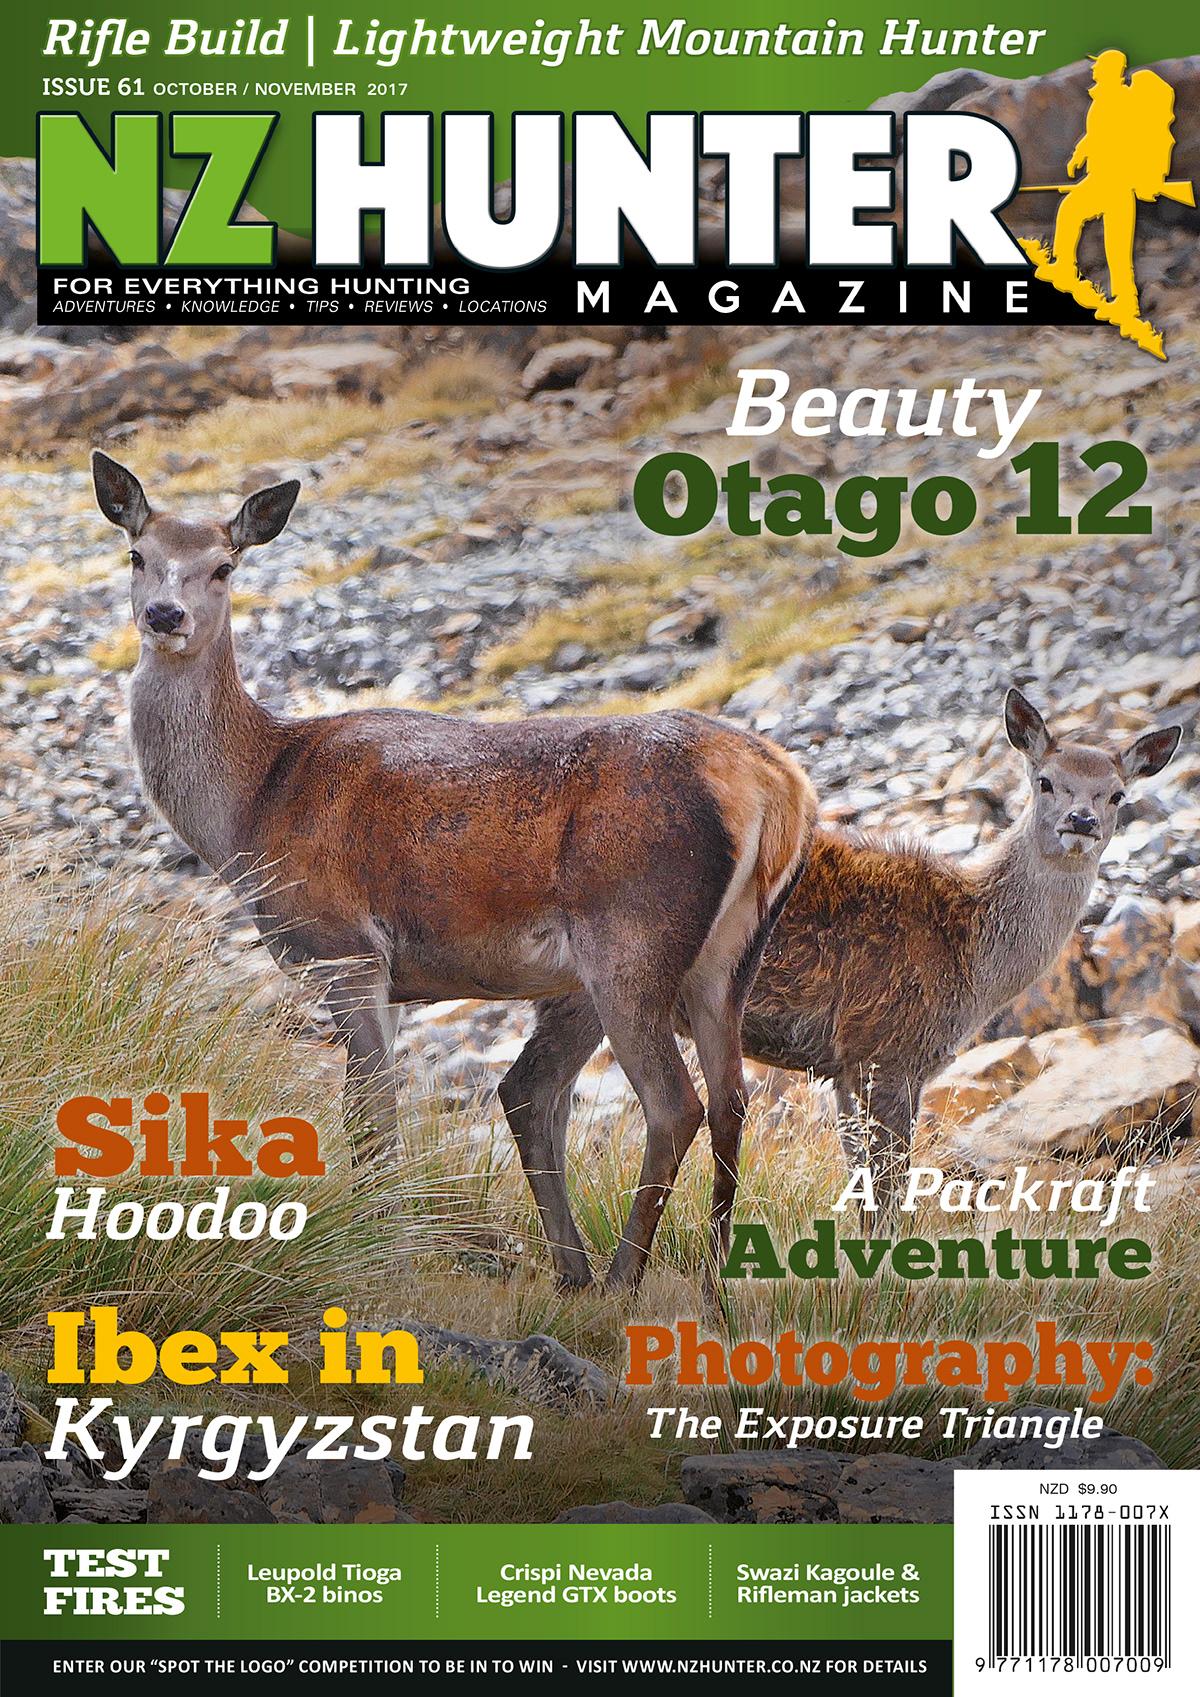 NZ Hunter Magazine on Behance